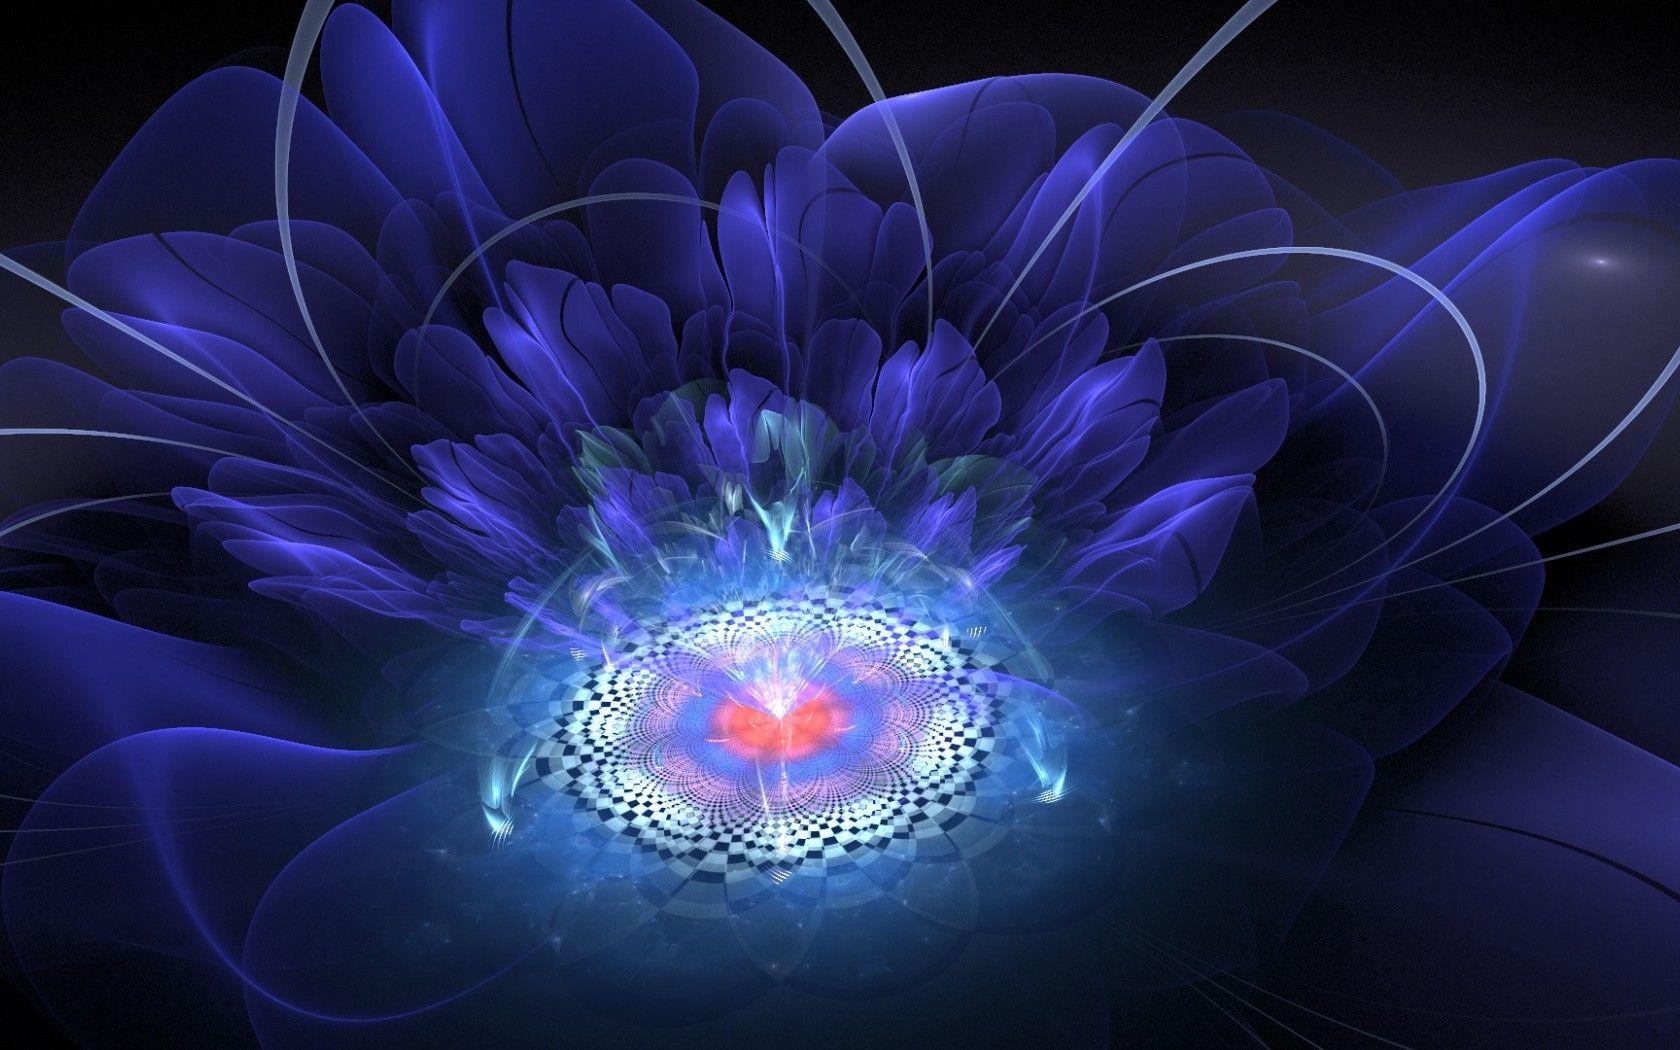 Обои цветок, свечение, фрактал, свет, абстракция. Абстракции foto 8